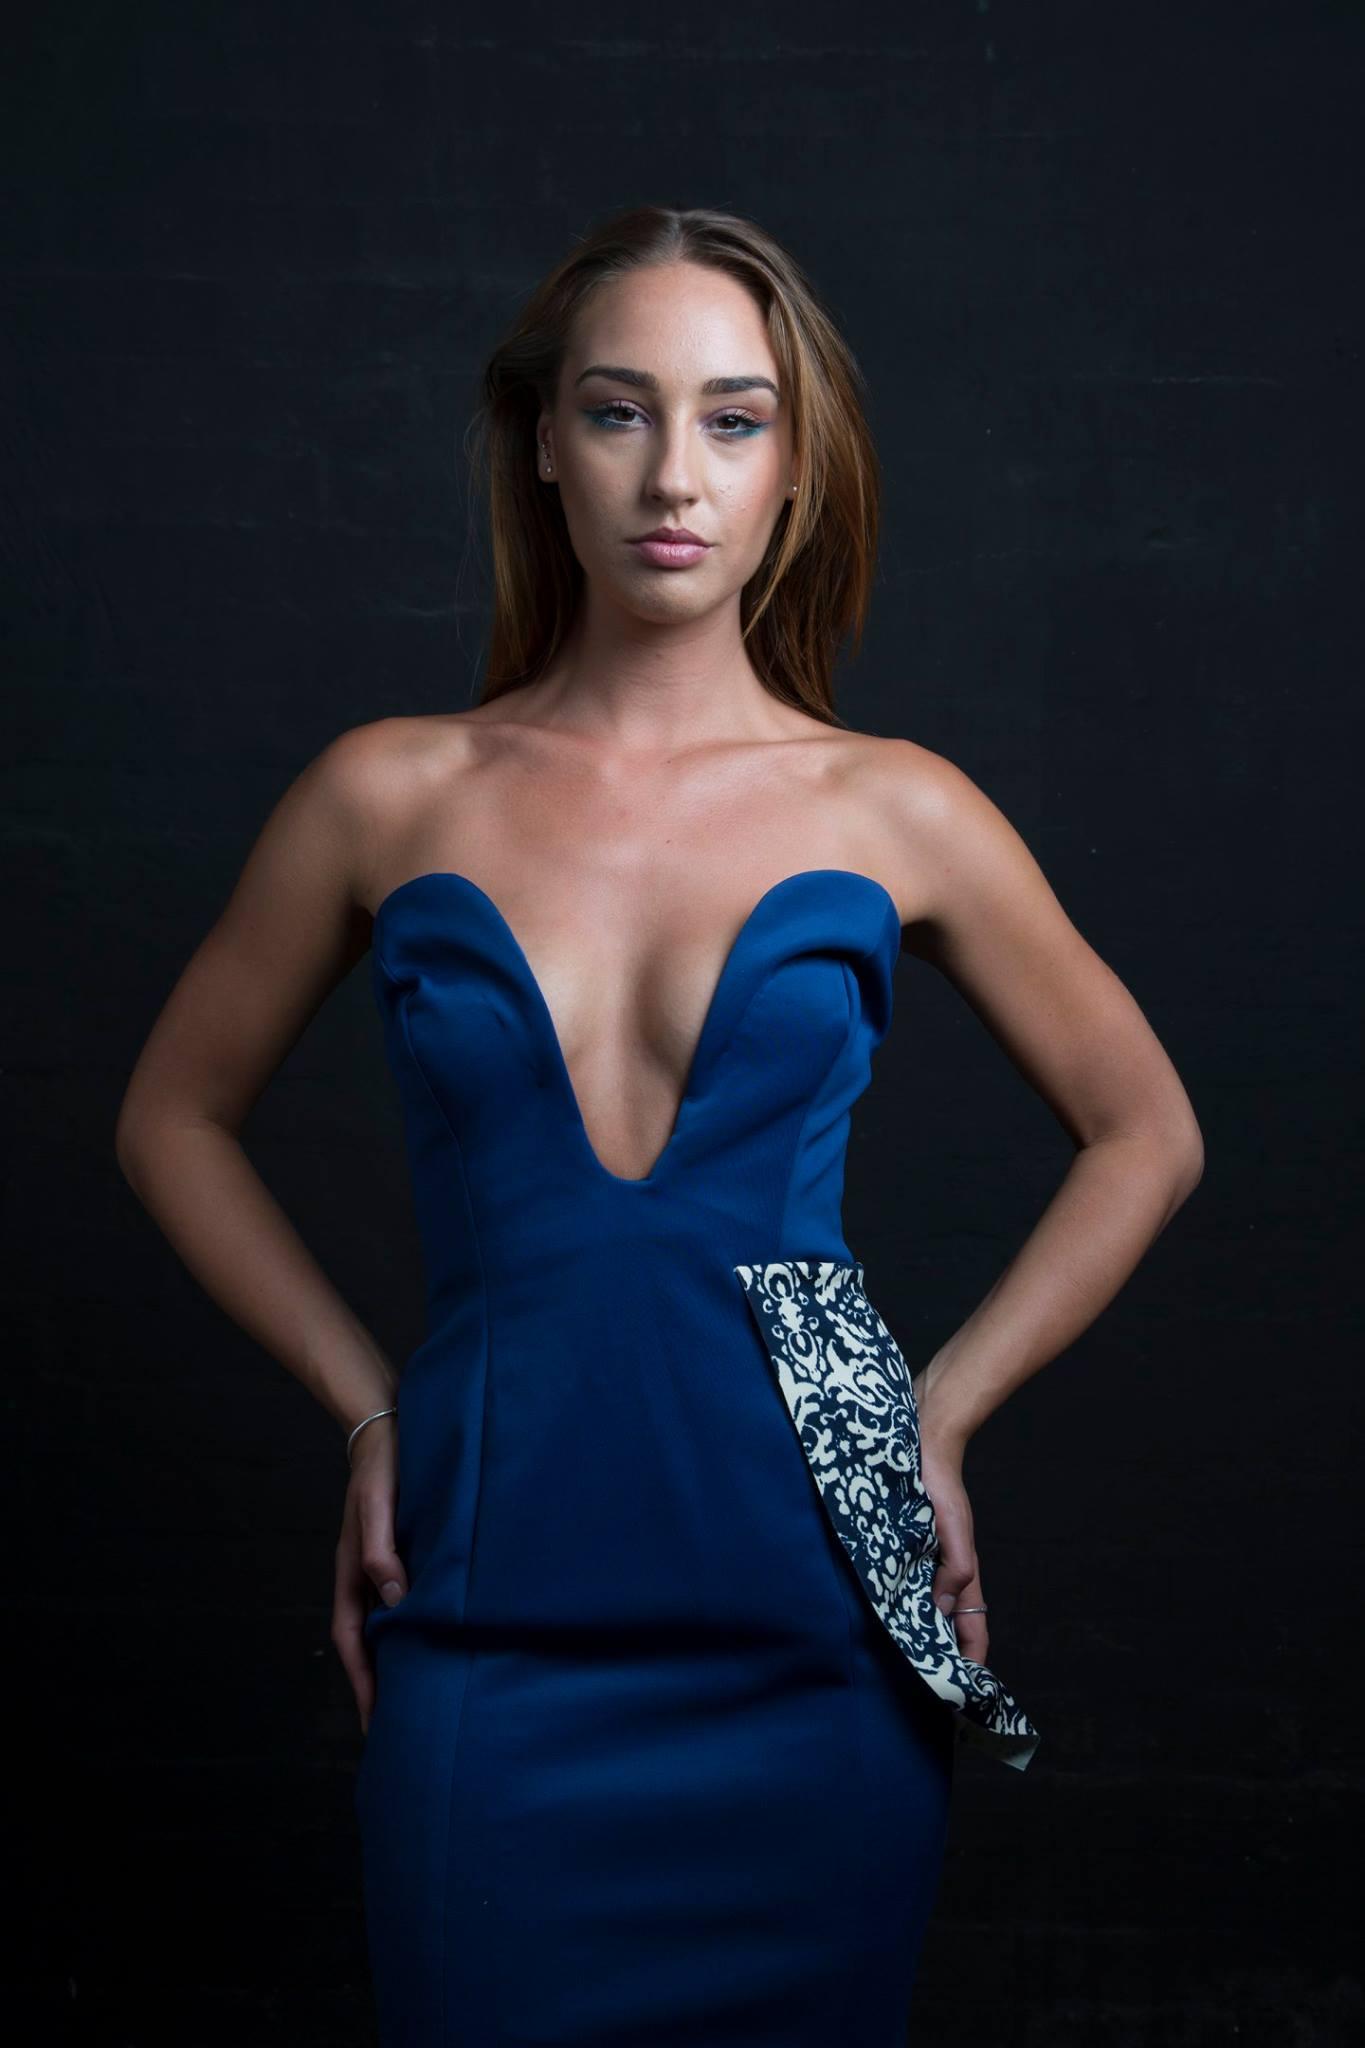 Fashion Photography  Model:Valentina Testa  Designer: Caitlin Hicks